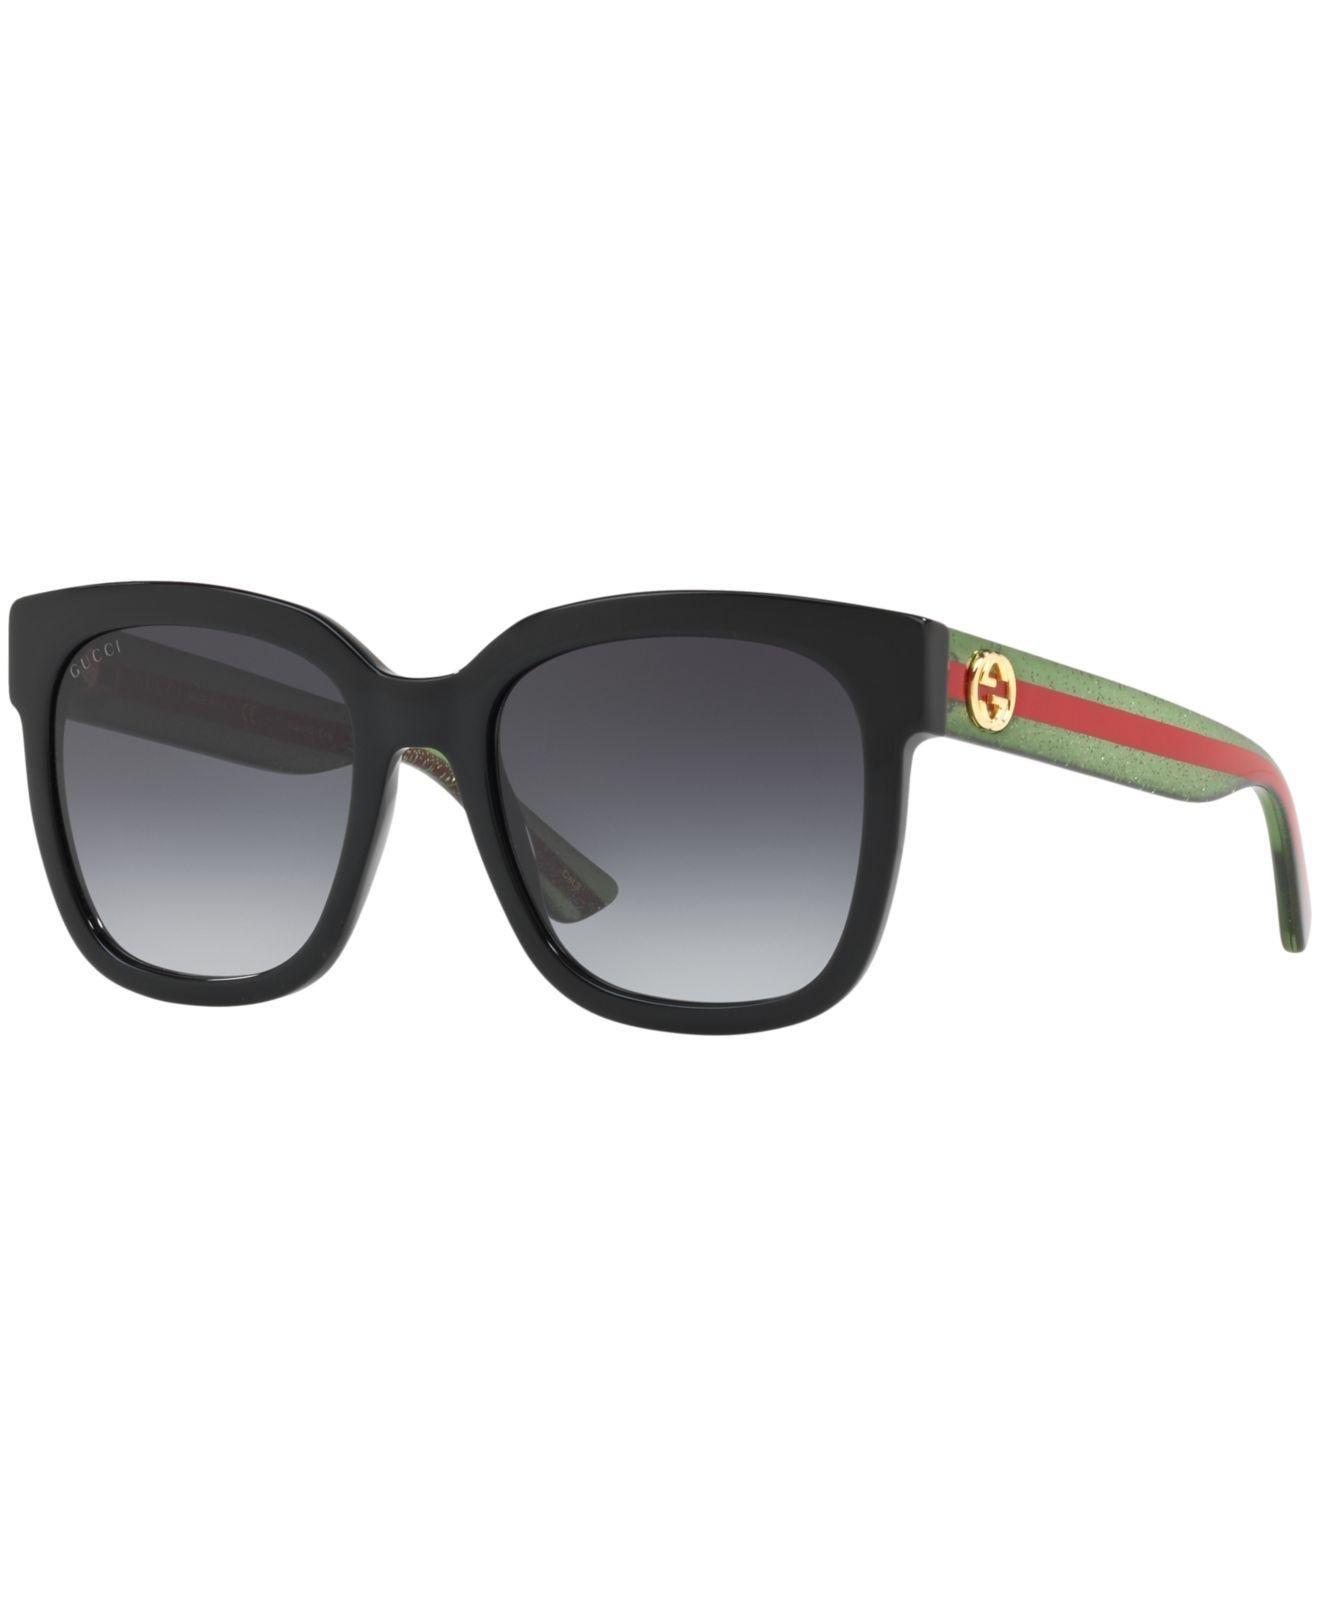 38c529439c Gucci - Black Sunglasses